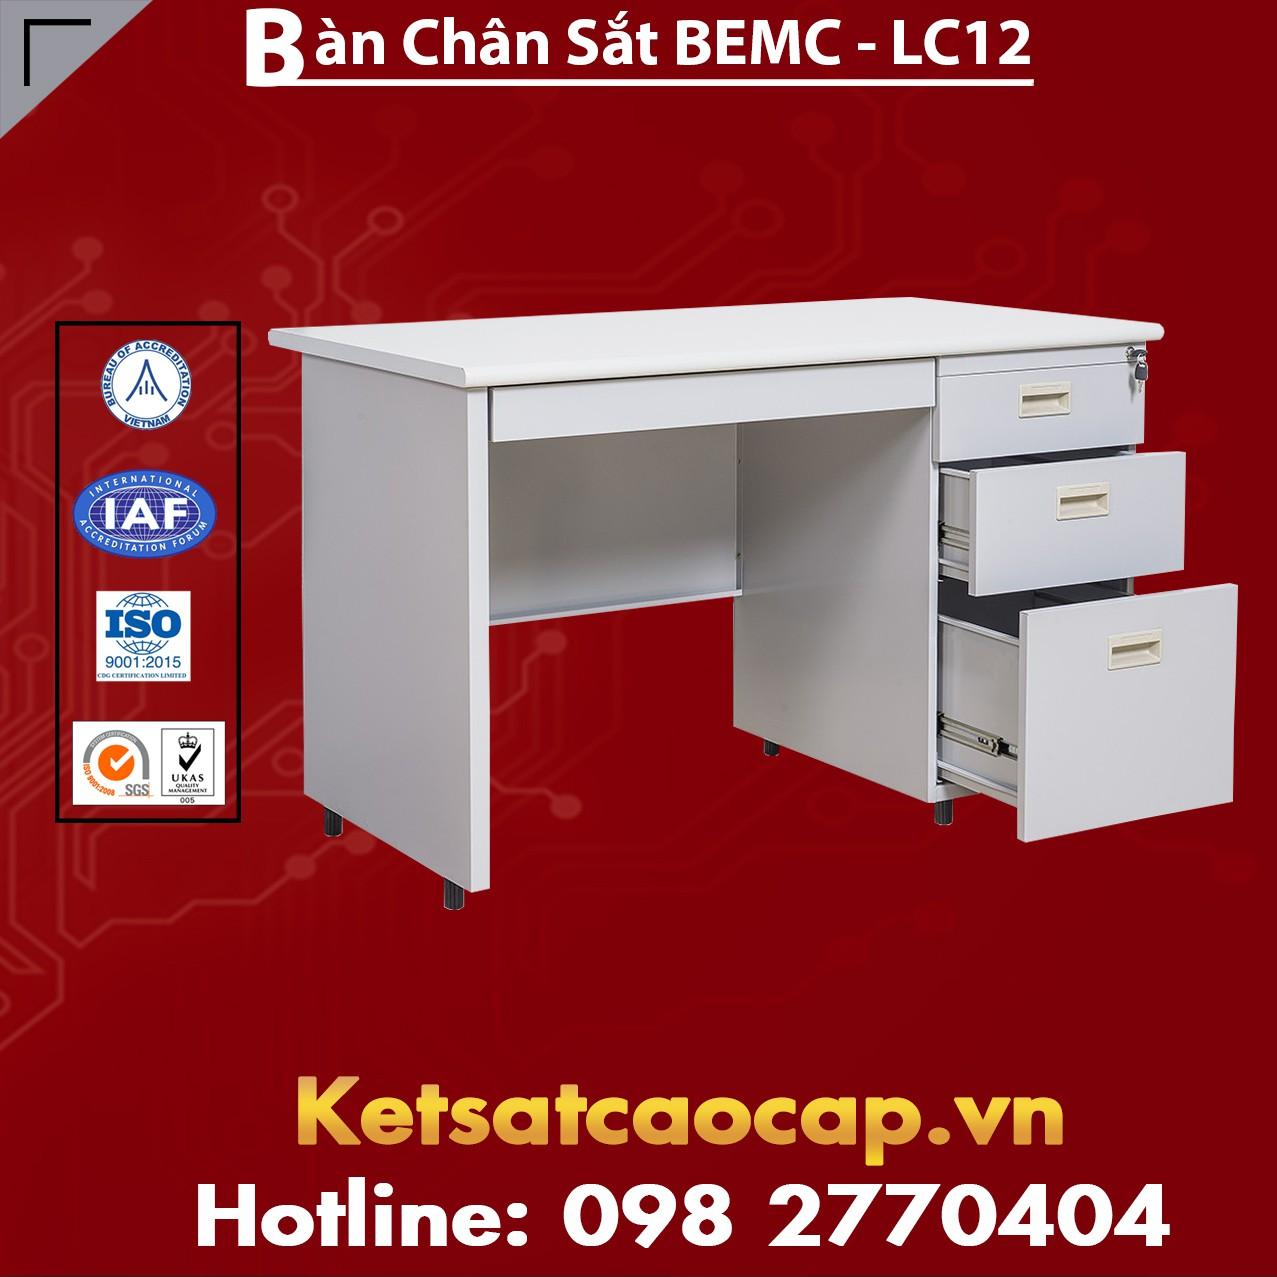 Bàn Chân Sắt BEMC - LC12